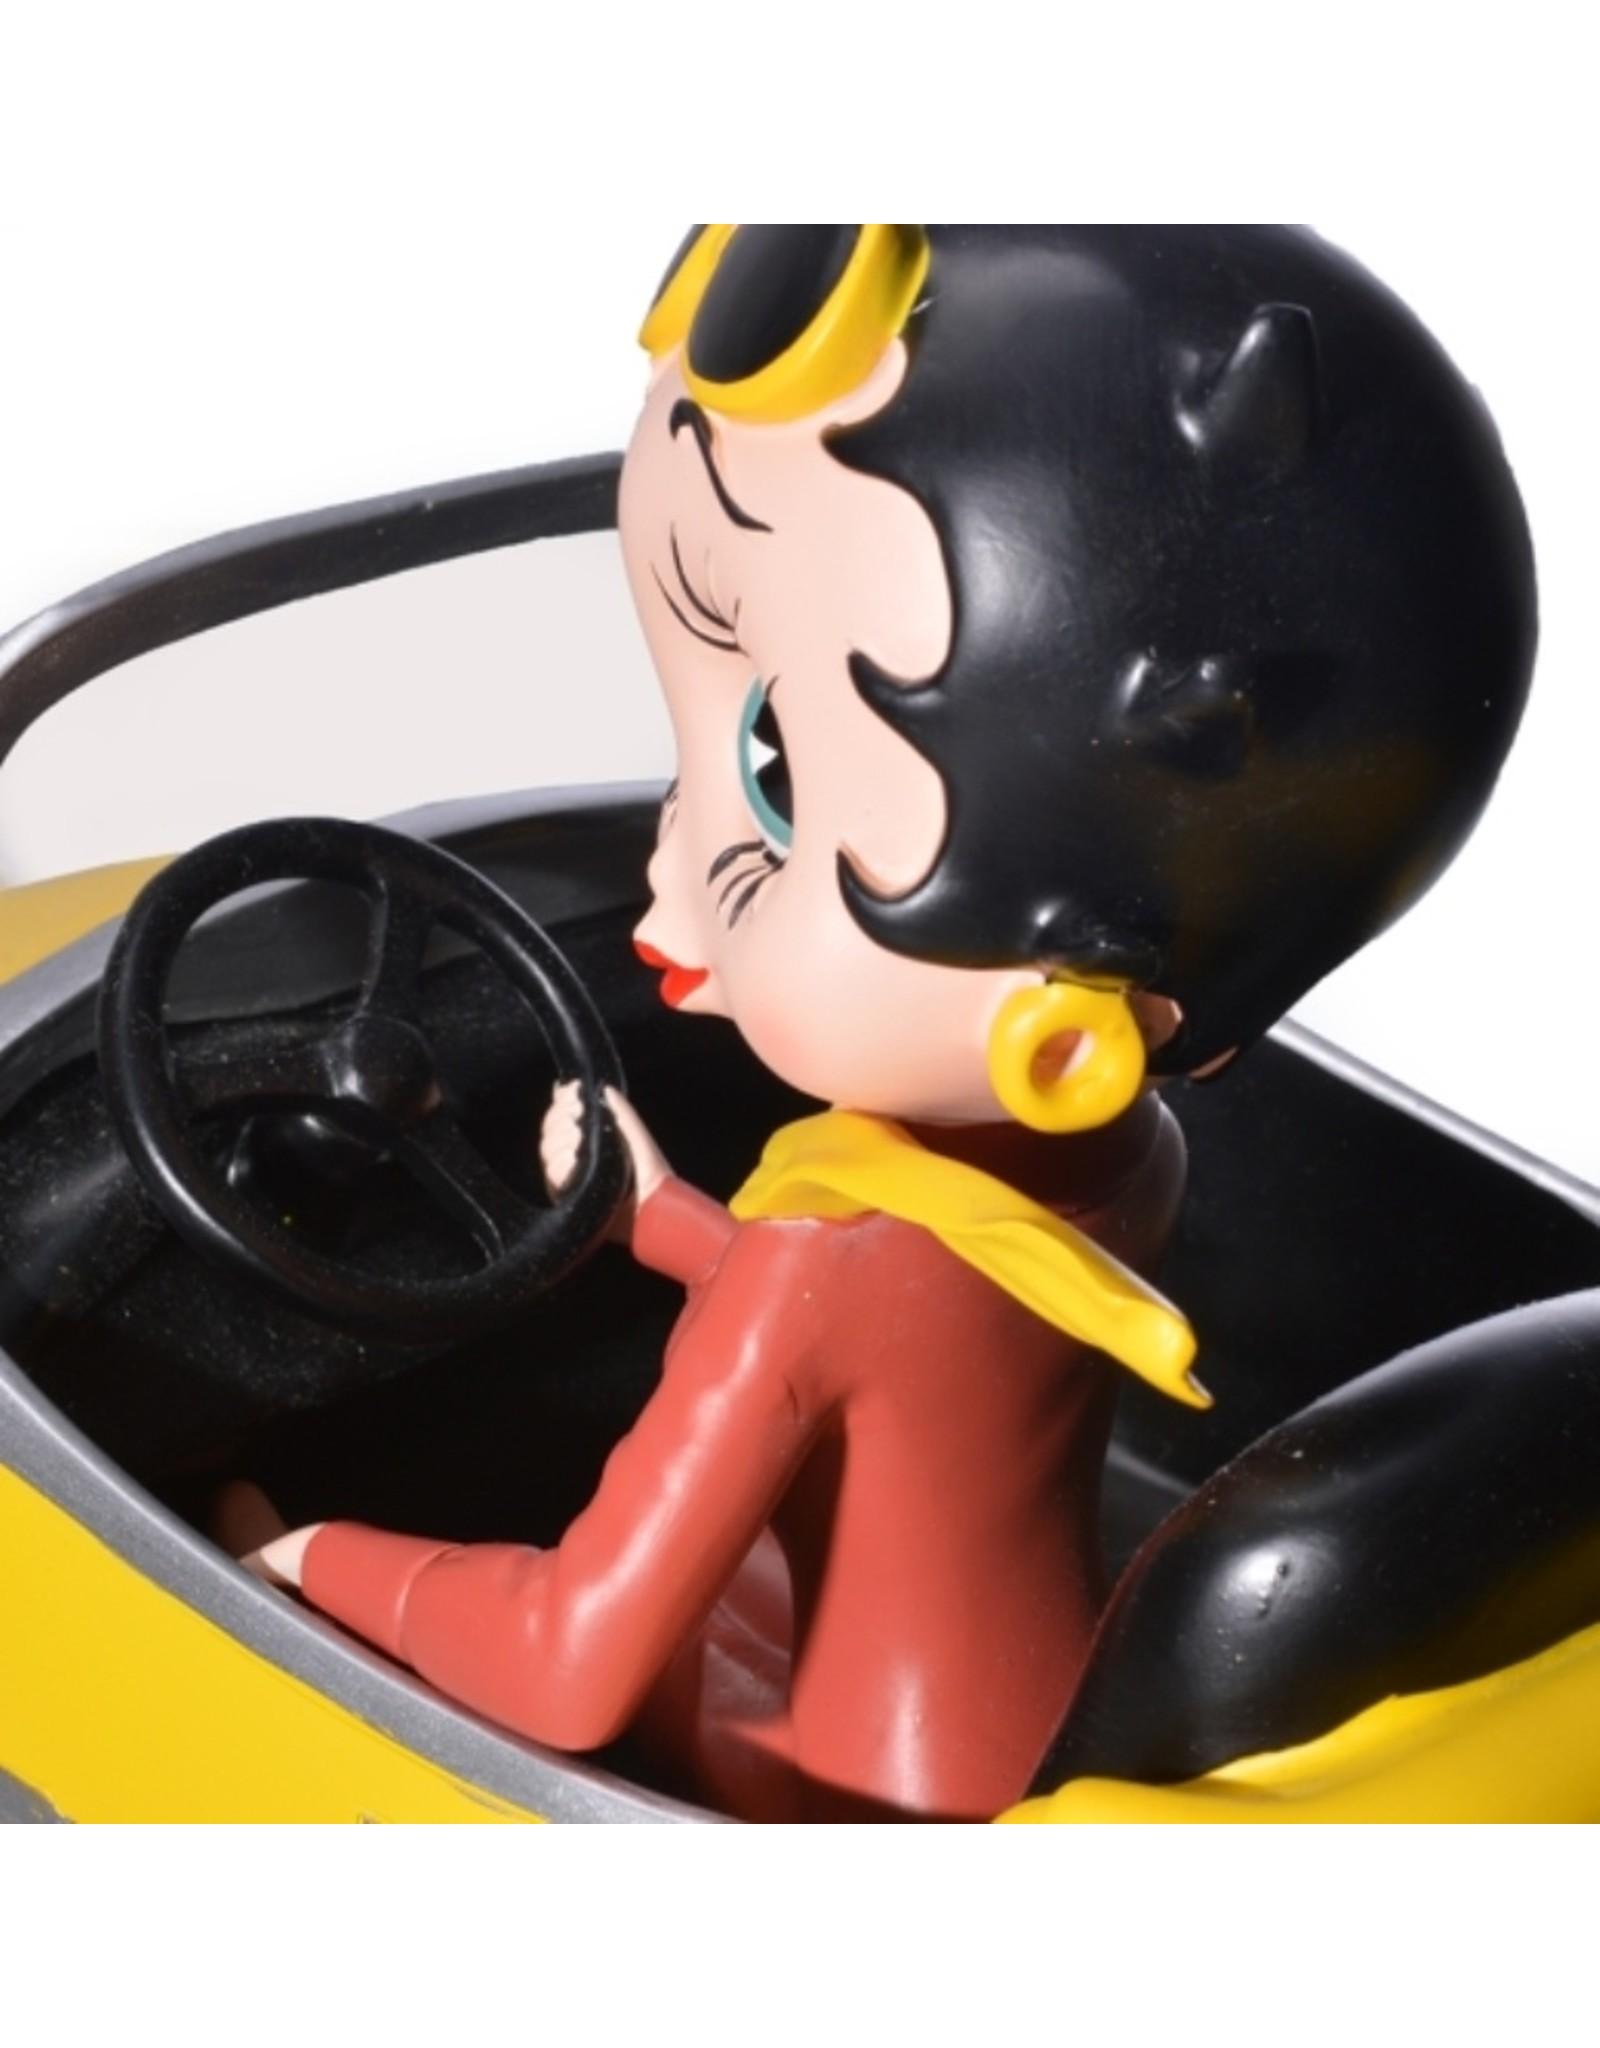 Betty Boop Betty Boop Collectables - Betty Boop in Yellow Sports Car